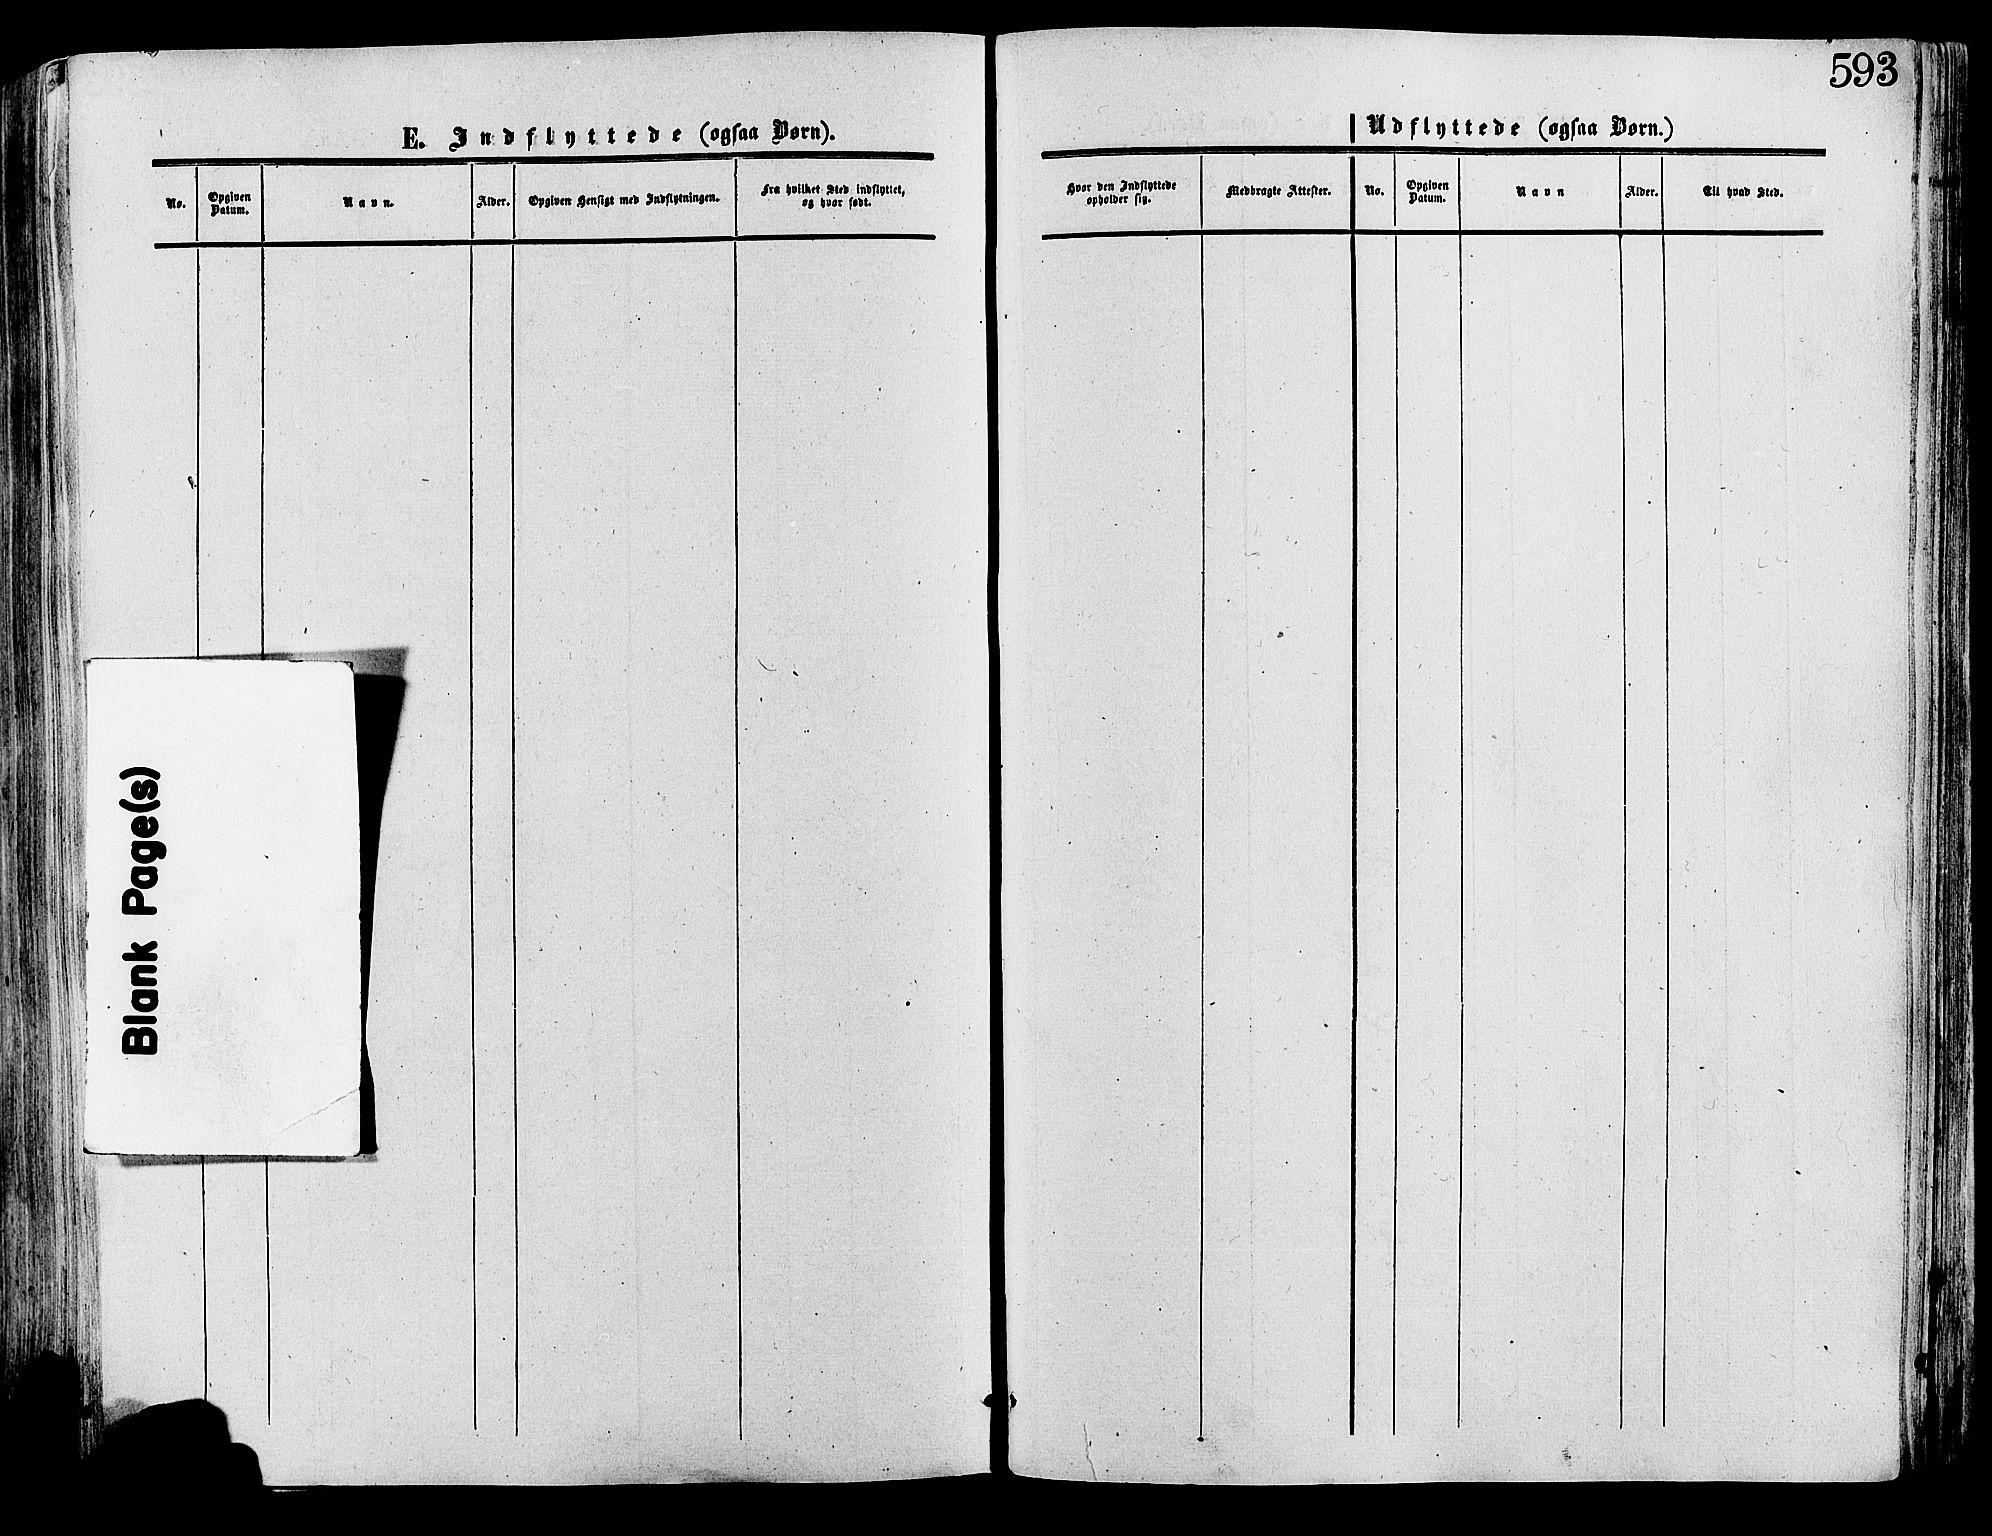 SAH, Lesja prestekontor, Ministerialbok nr. 8, 1854-1880, s. 593